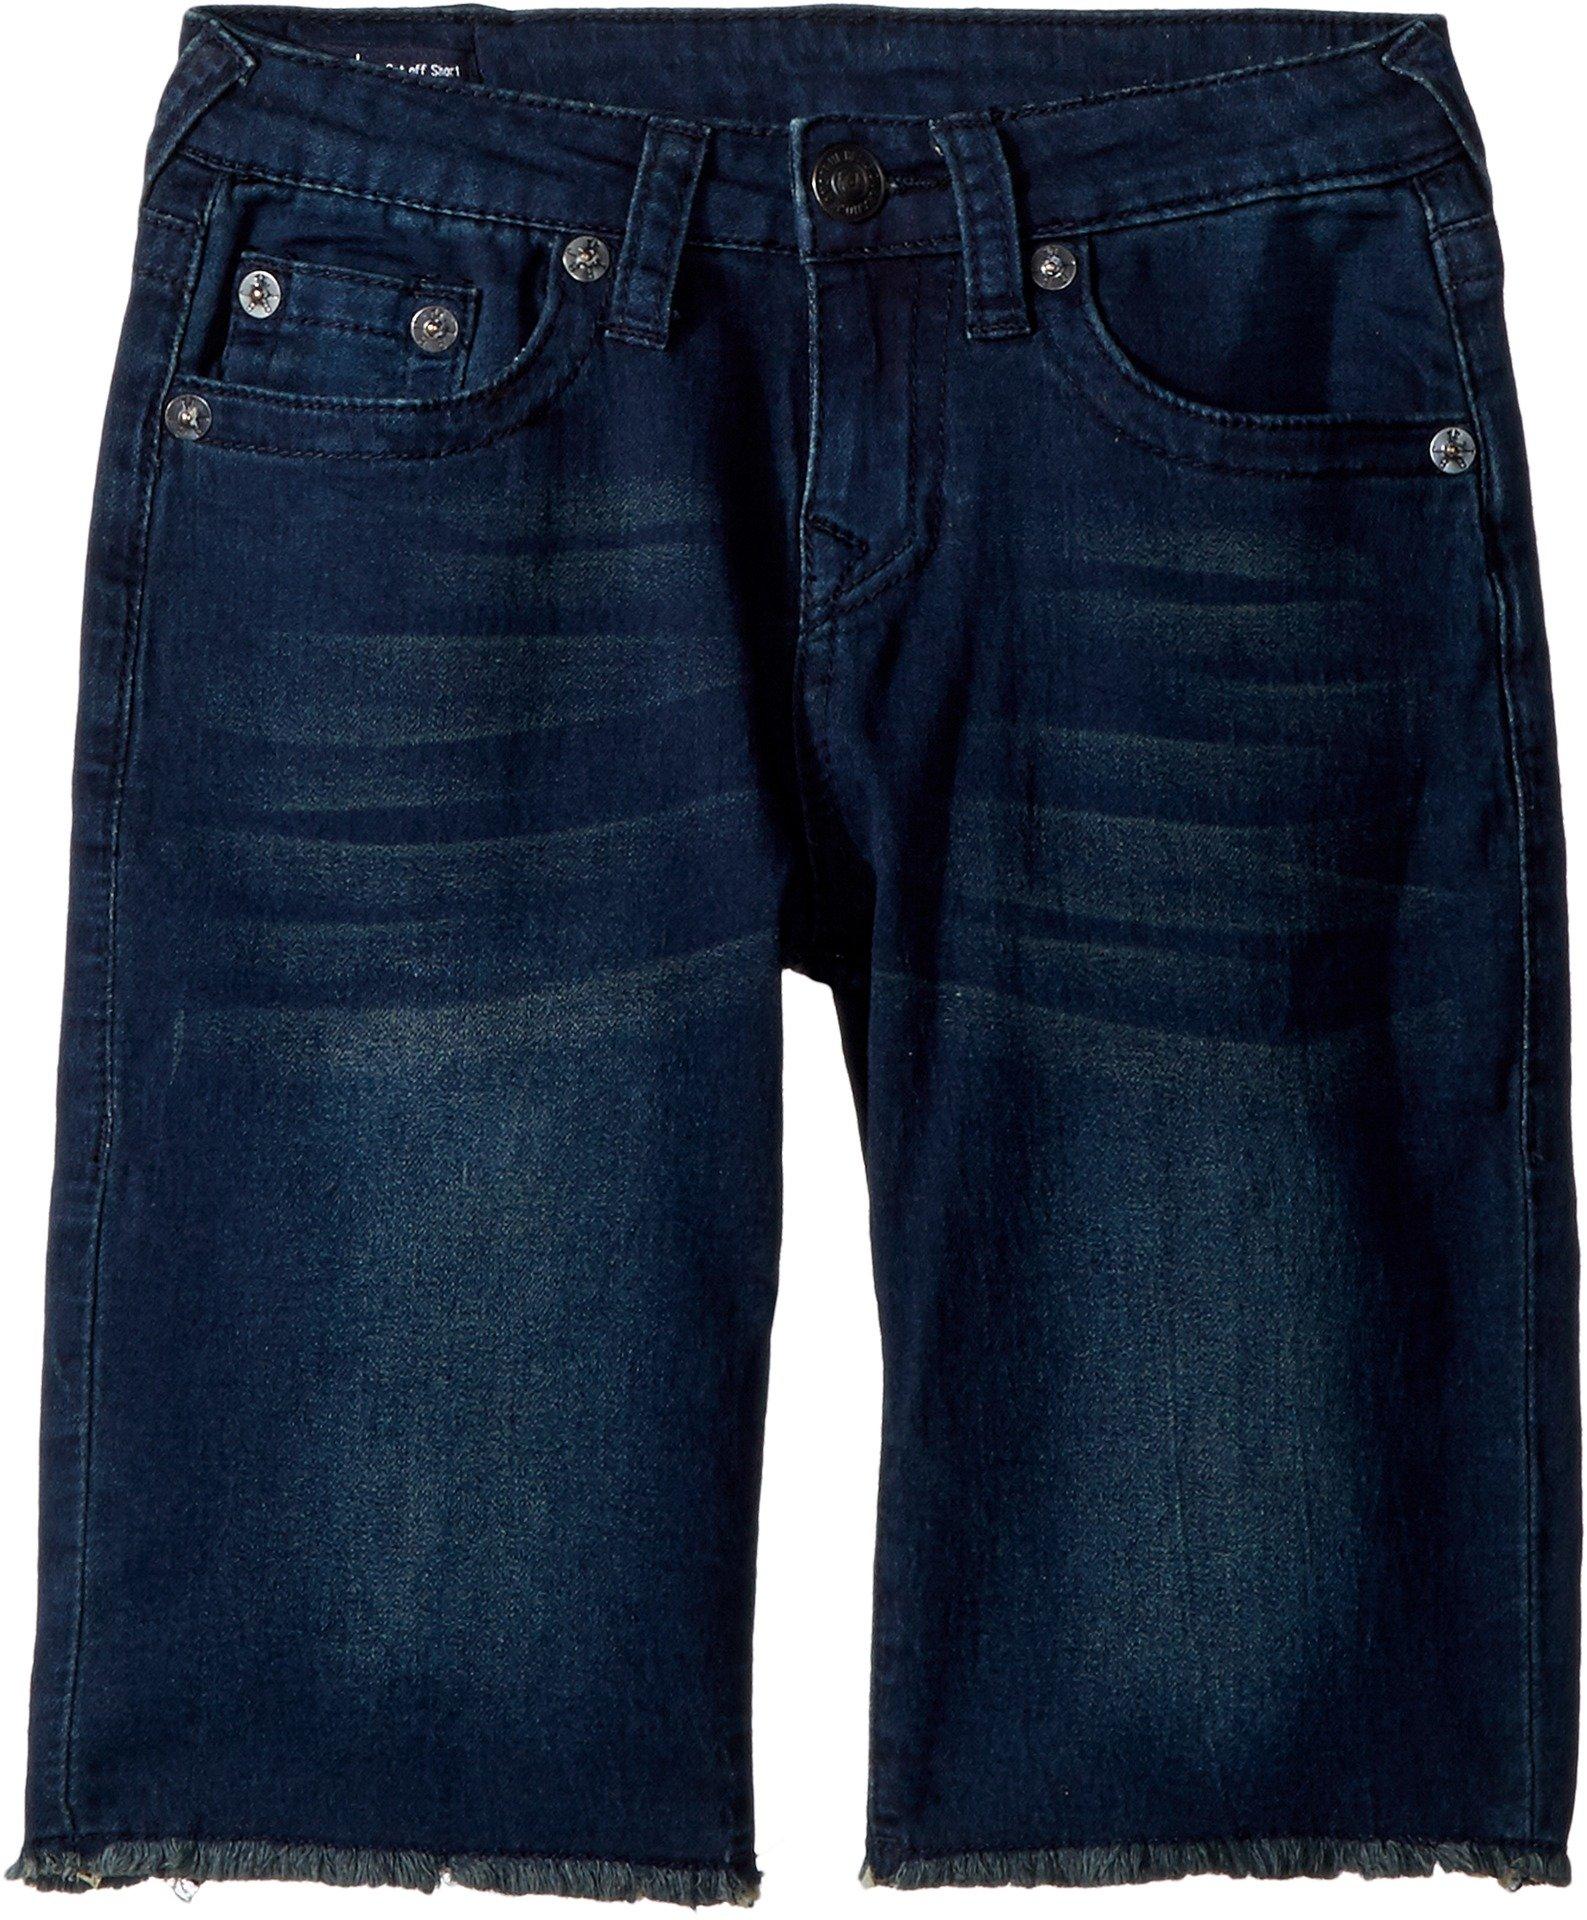 True Religion Kids Boy's FT Geno Shorts (Big Kids) Bomb Blue 16